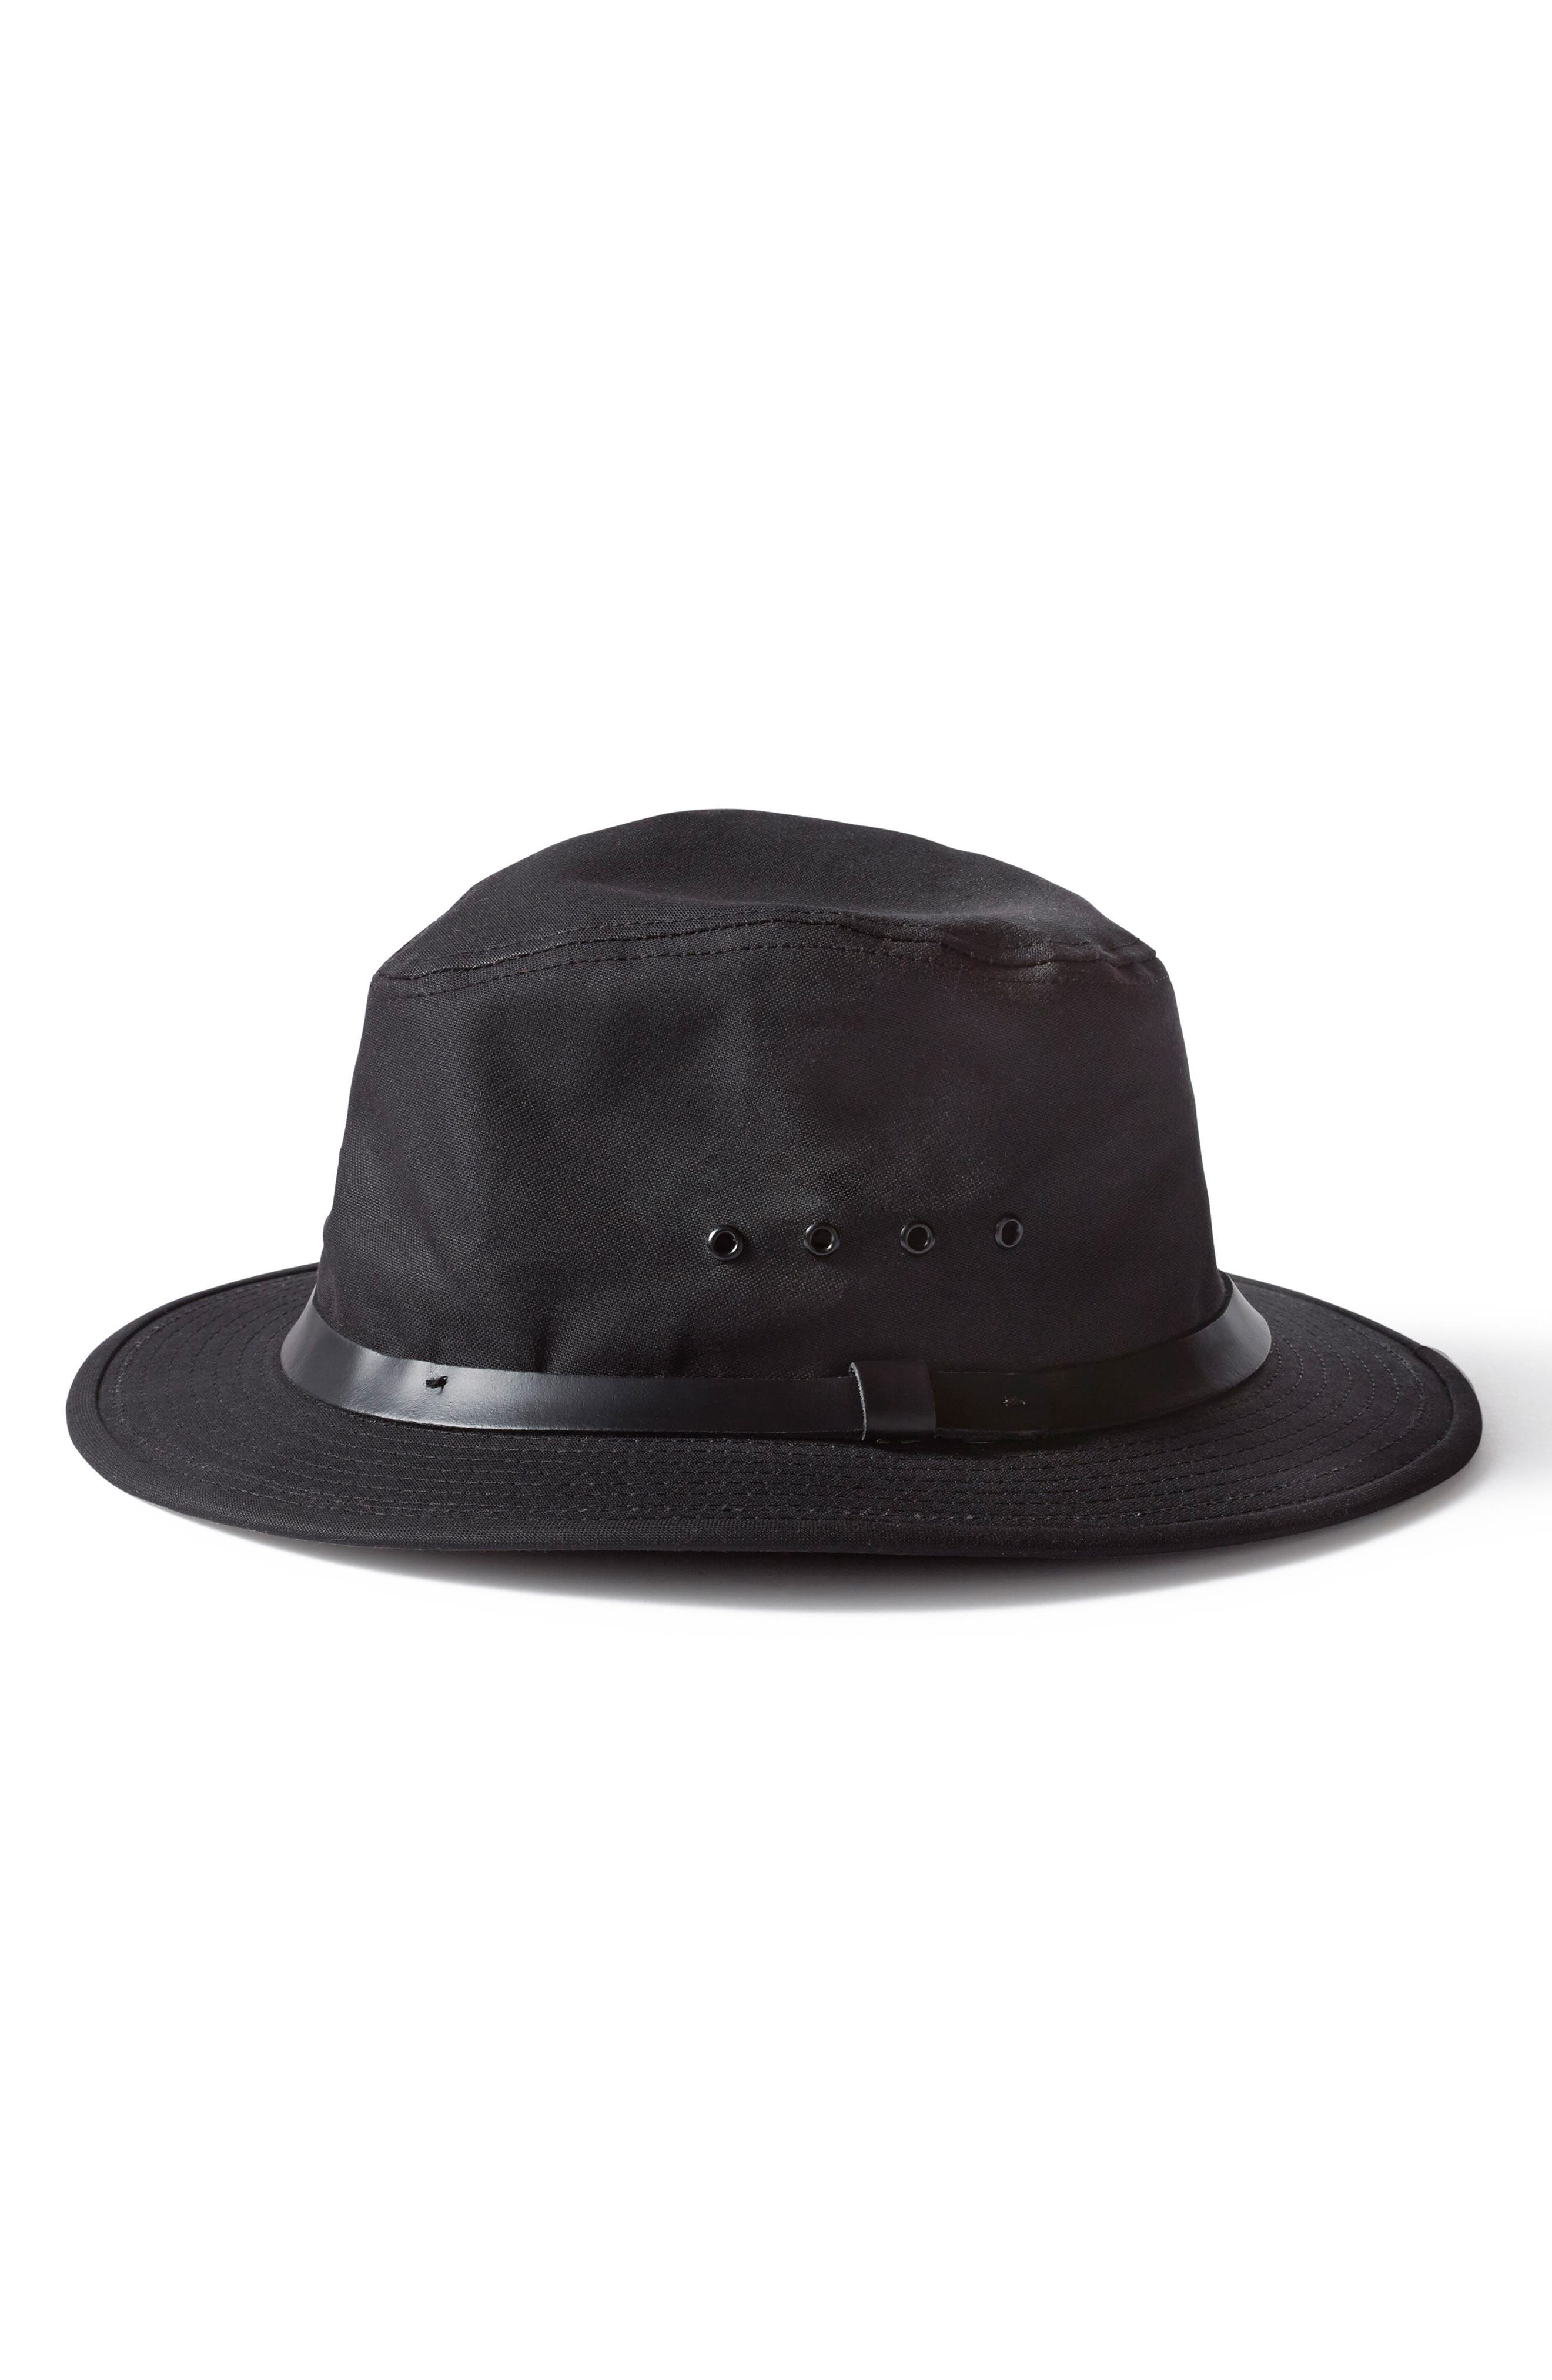 Tin Packer Hat,                         Main,                         color, Black